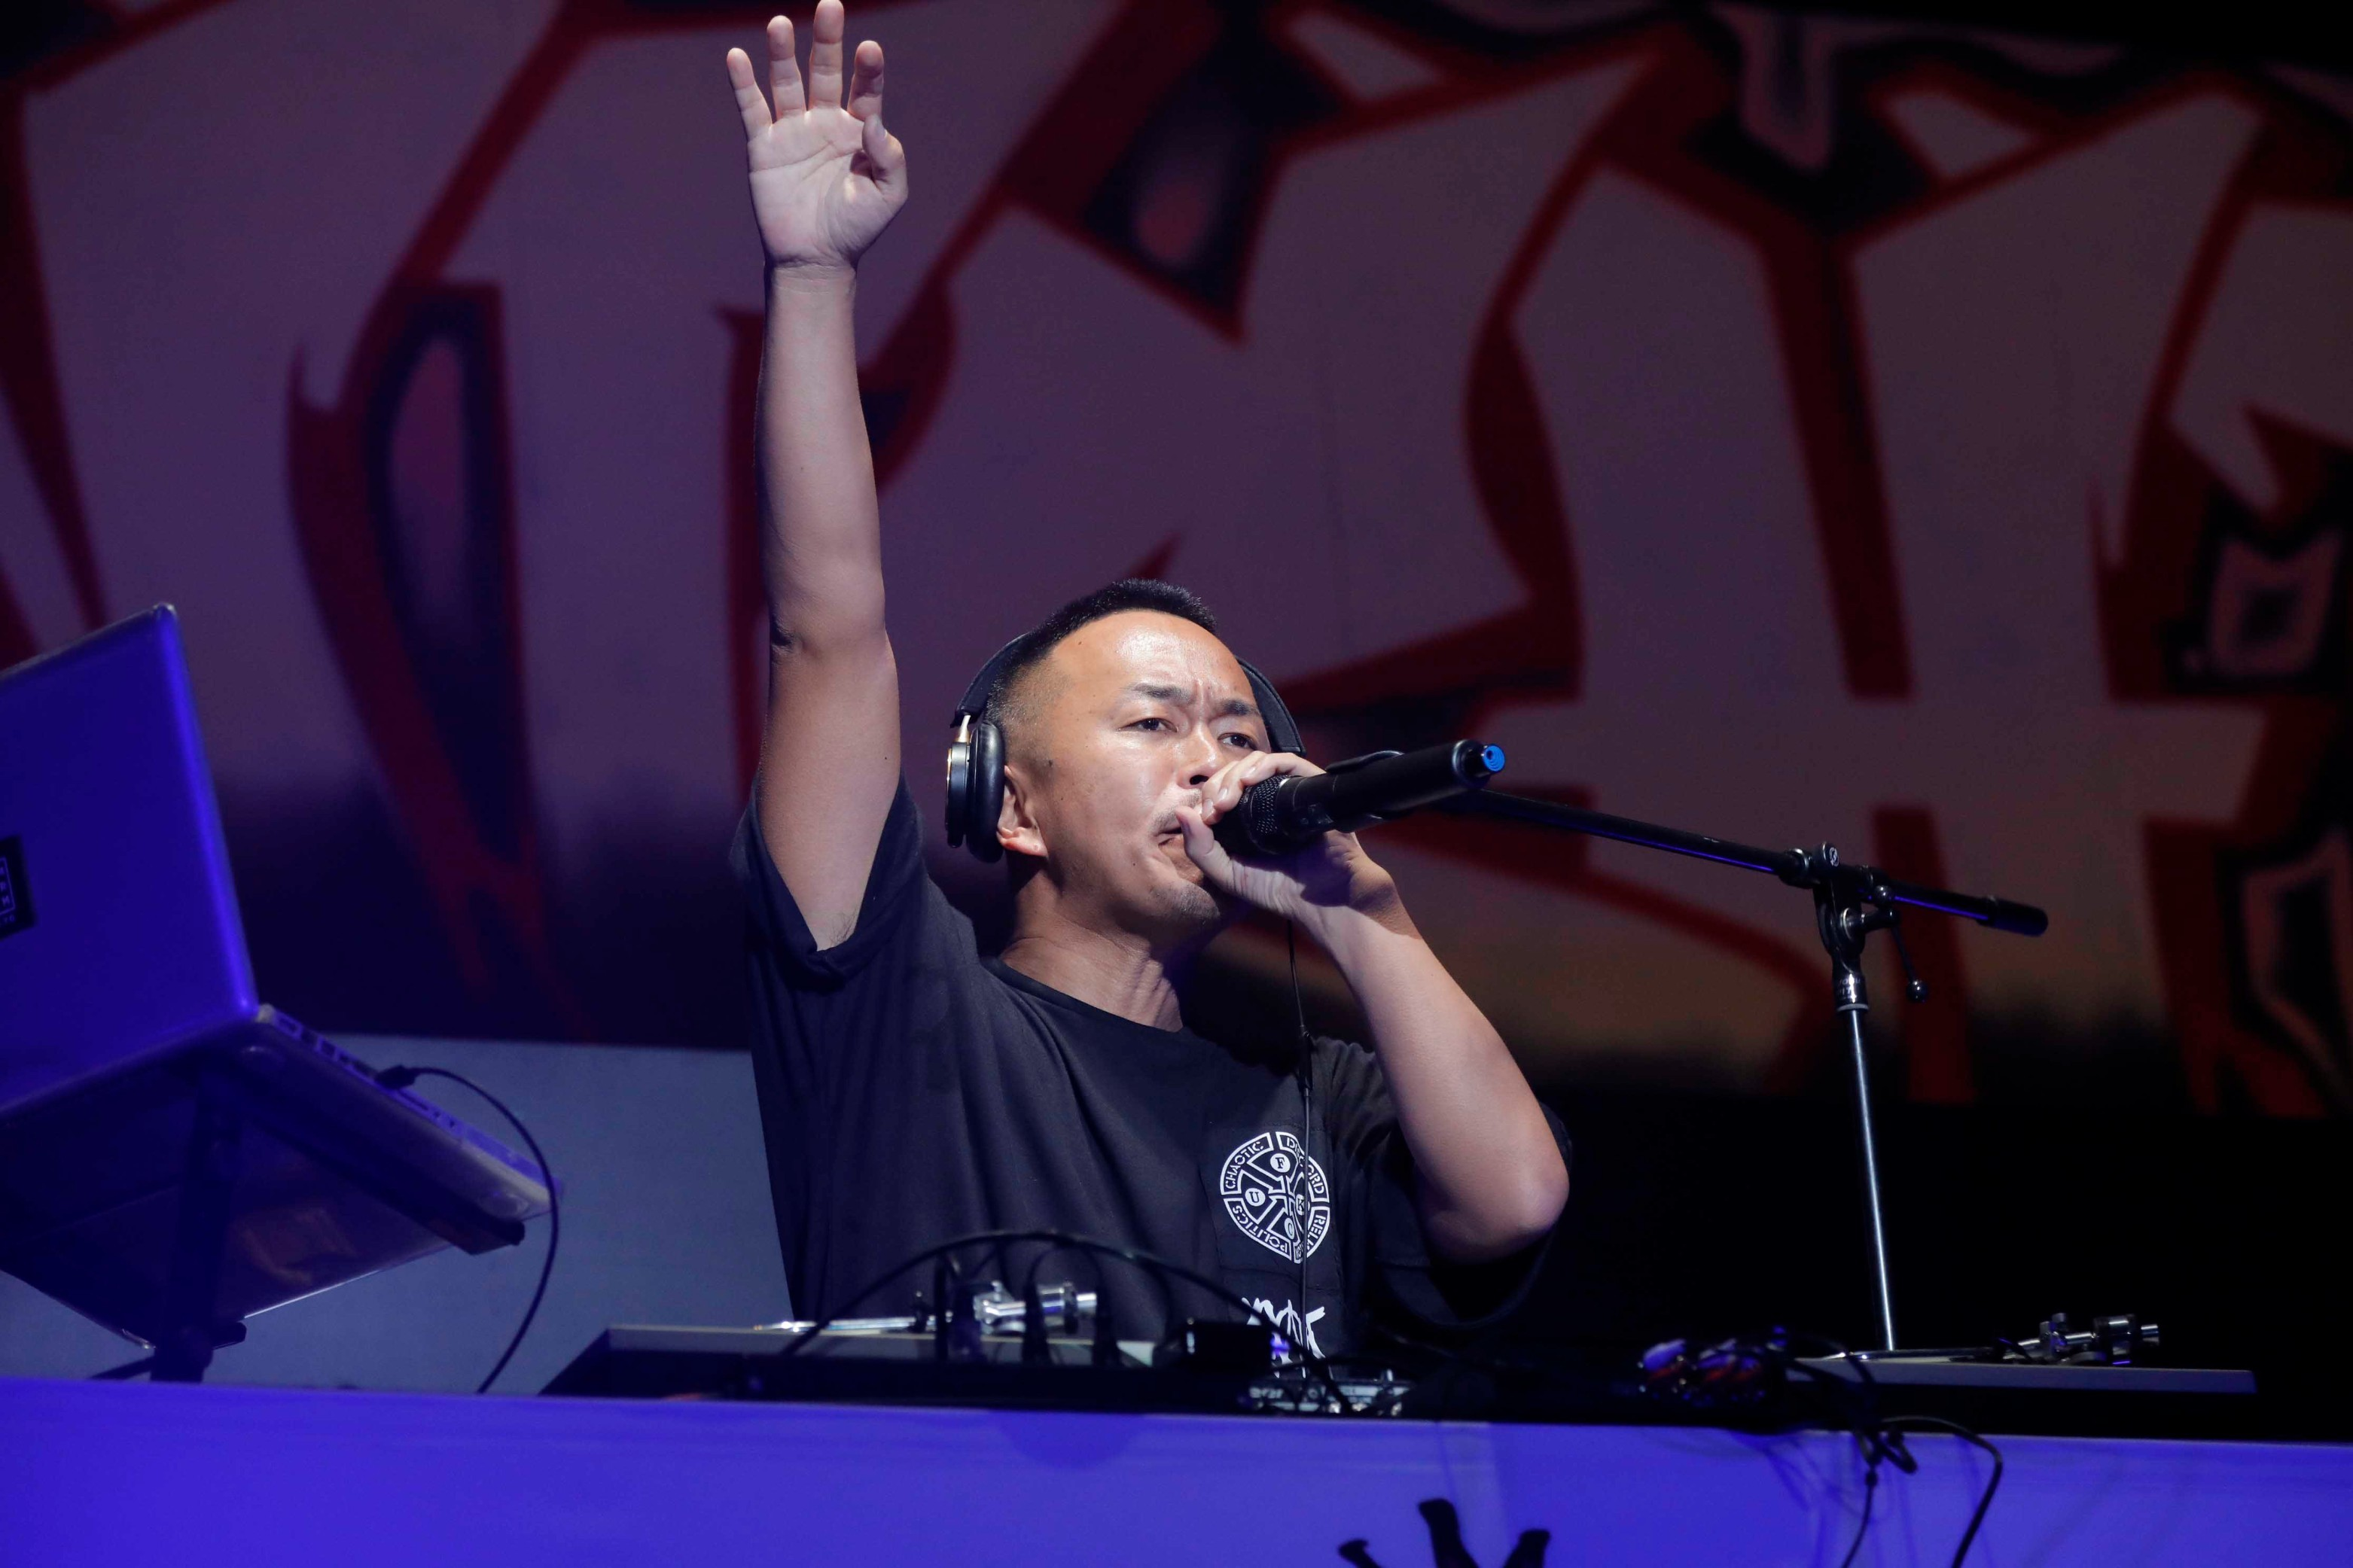 DJ LEAD photo by HAJIME KAMIIISAKA